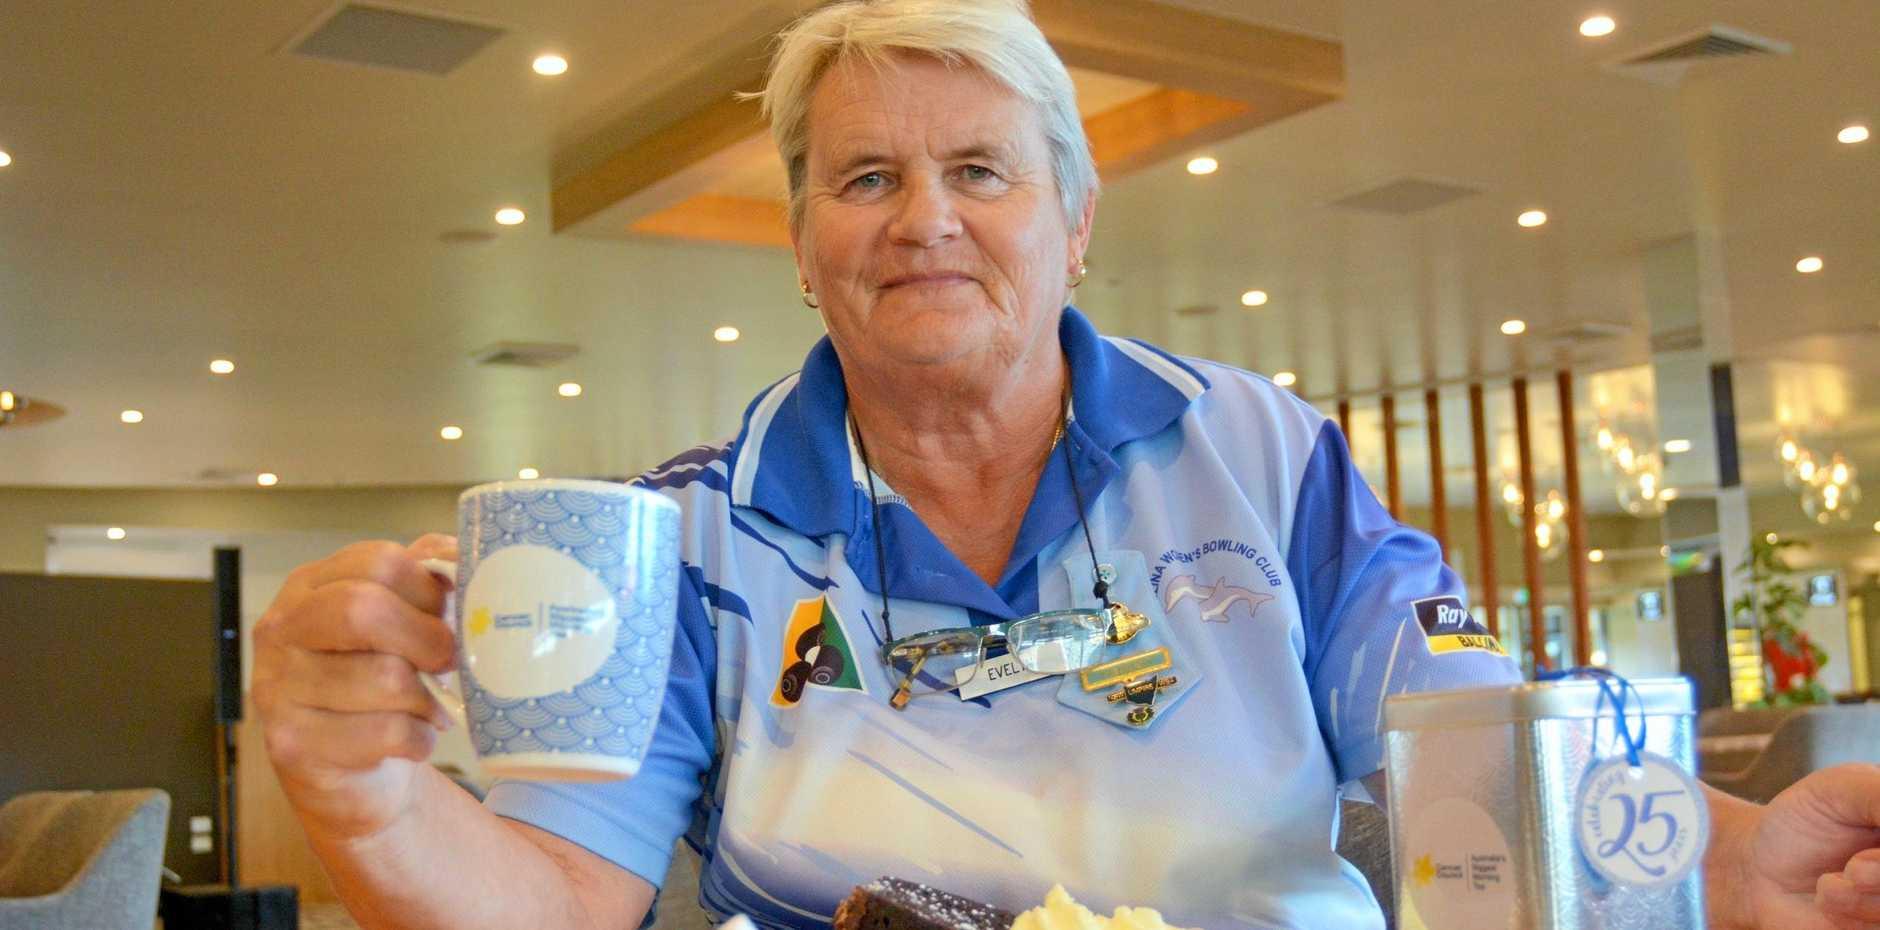 Ballina Women's Bowling Club president Evelyn Fox prepares for a major fundraiser, Australia's Biggest Morning Tea.